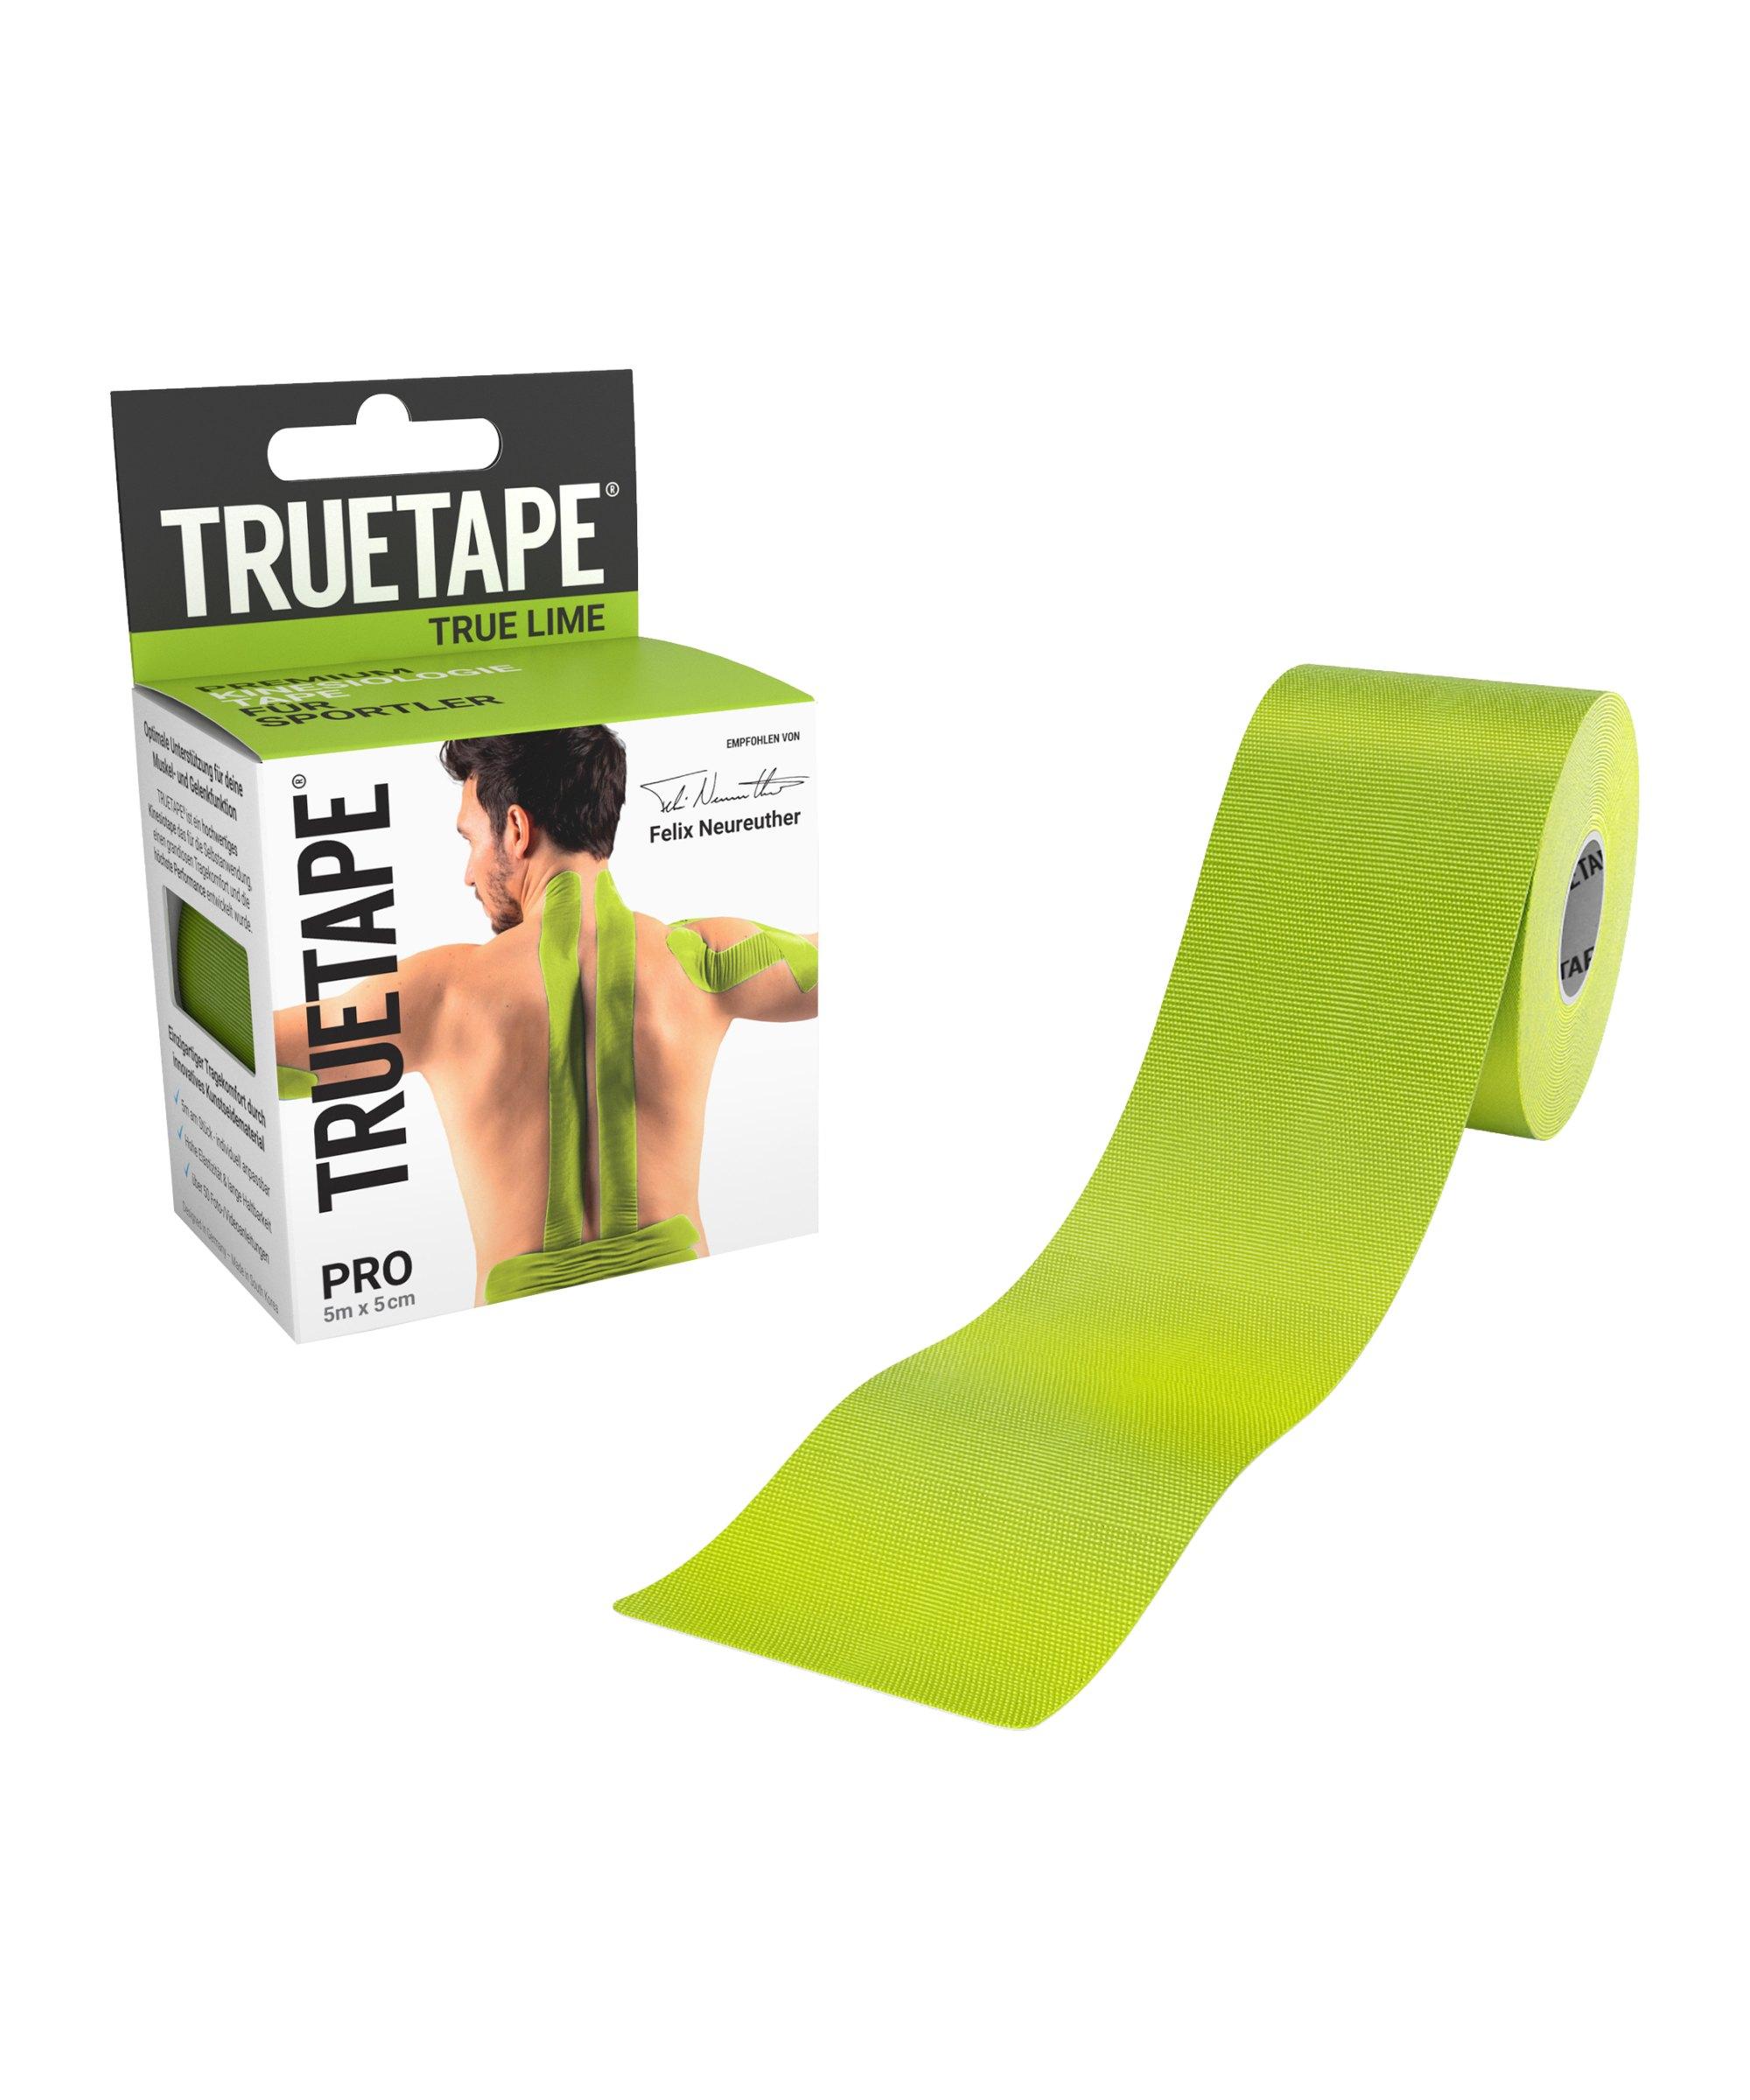 Truetape Athlete Edition Pro Uncut Grün - gruen